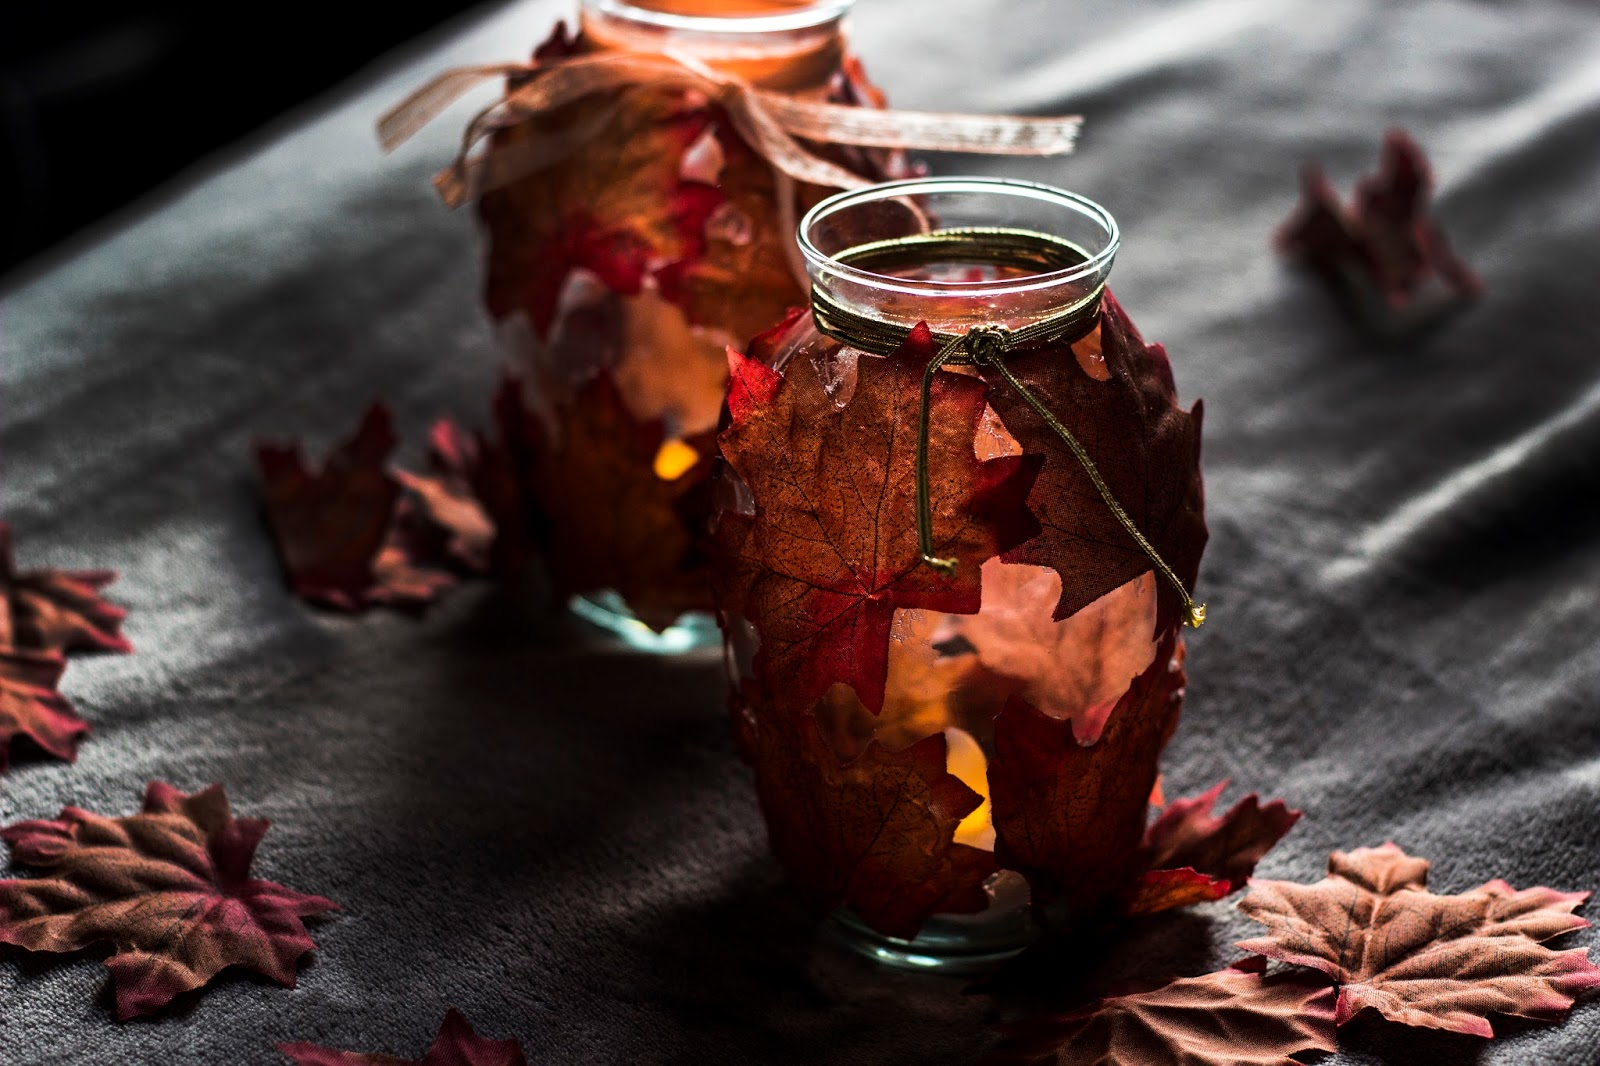 http://www.thewhimsicalwildling.com/2016/11/diy-autumnal-glow-jars.html